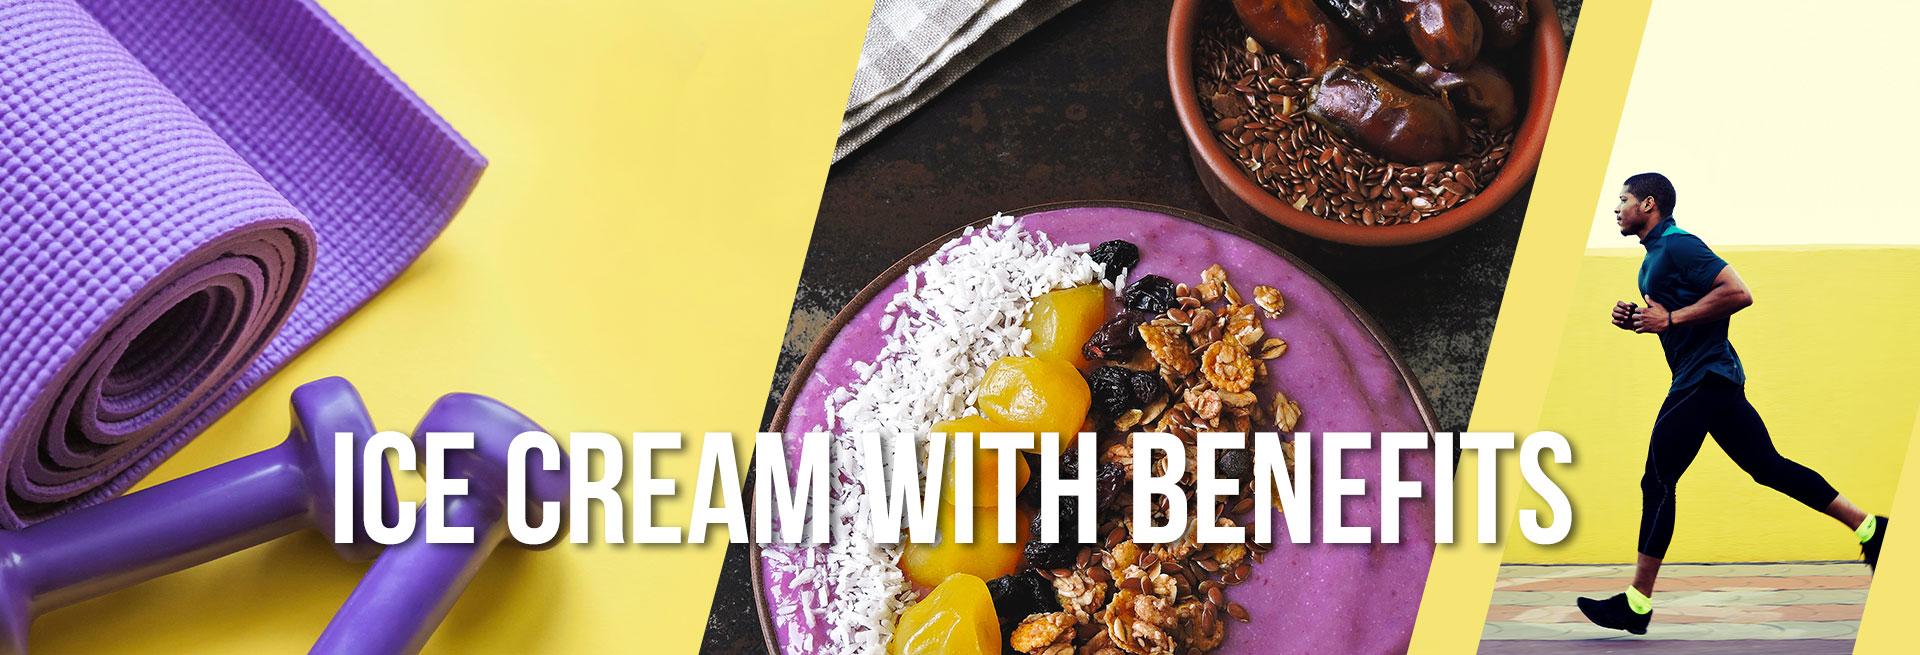 Ice cream with benfits